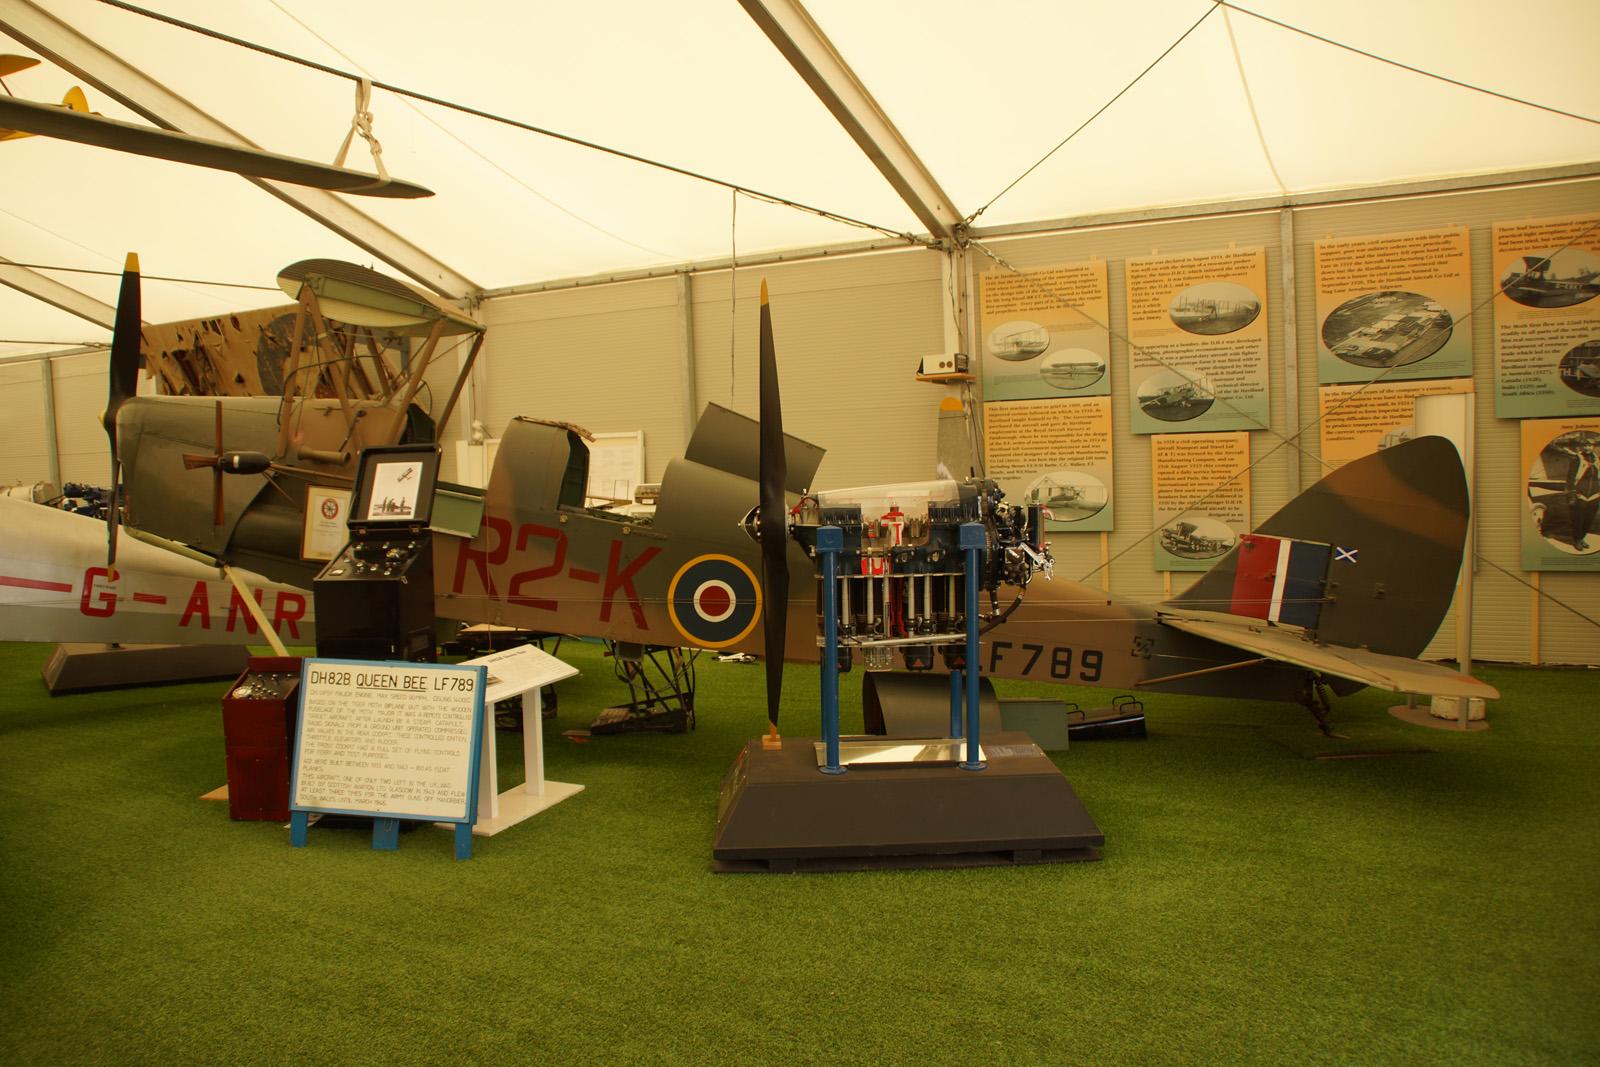 de Havilland DH82B